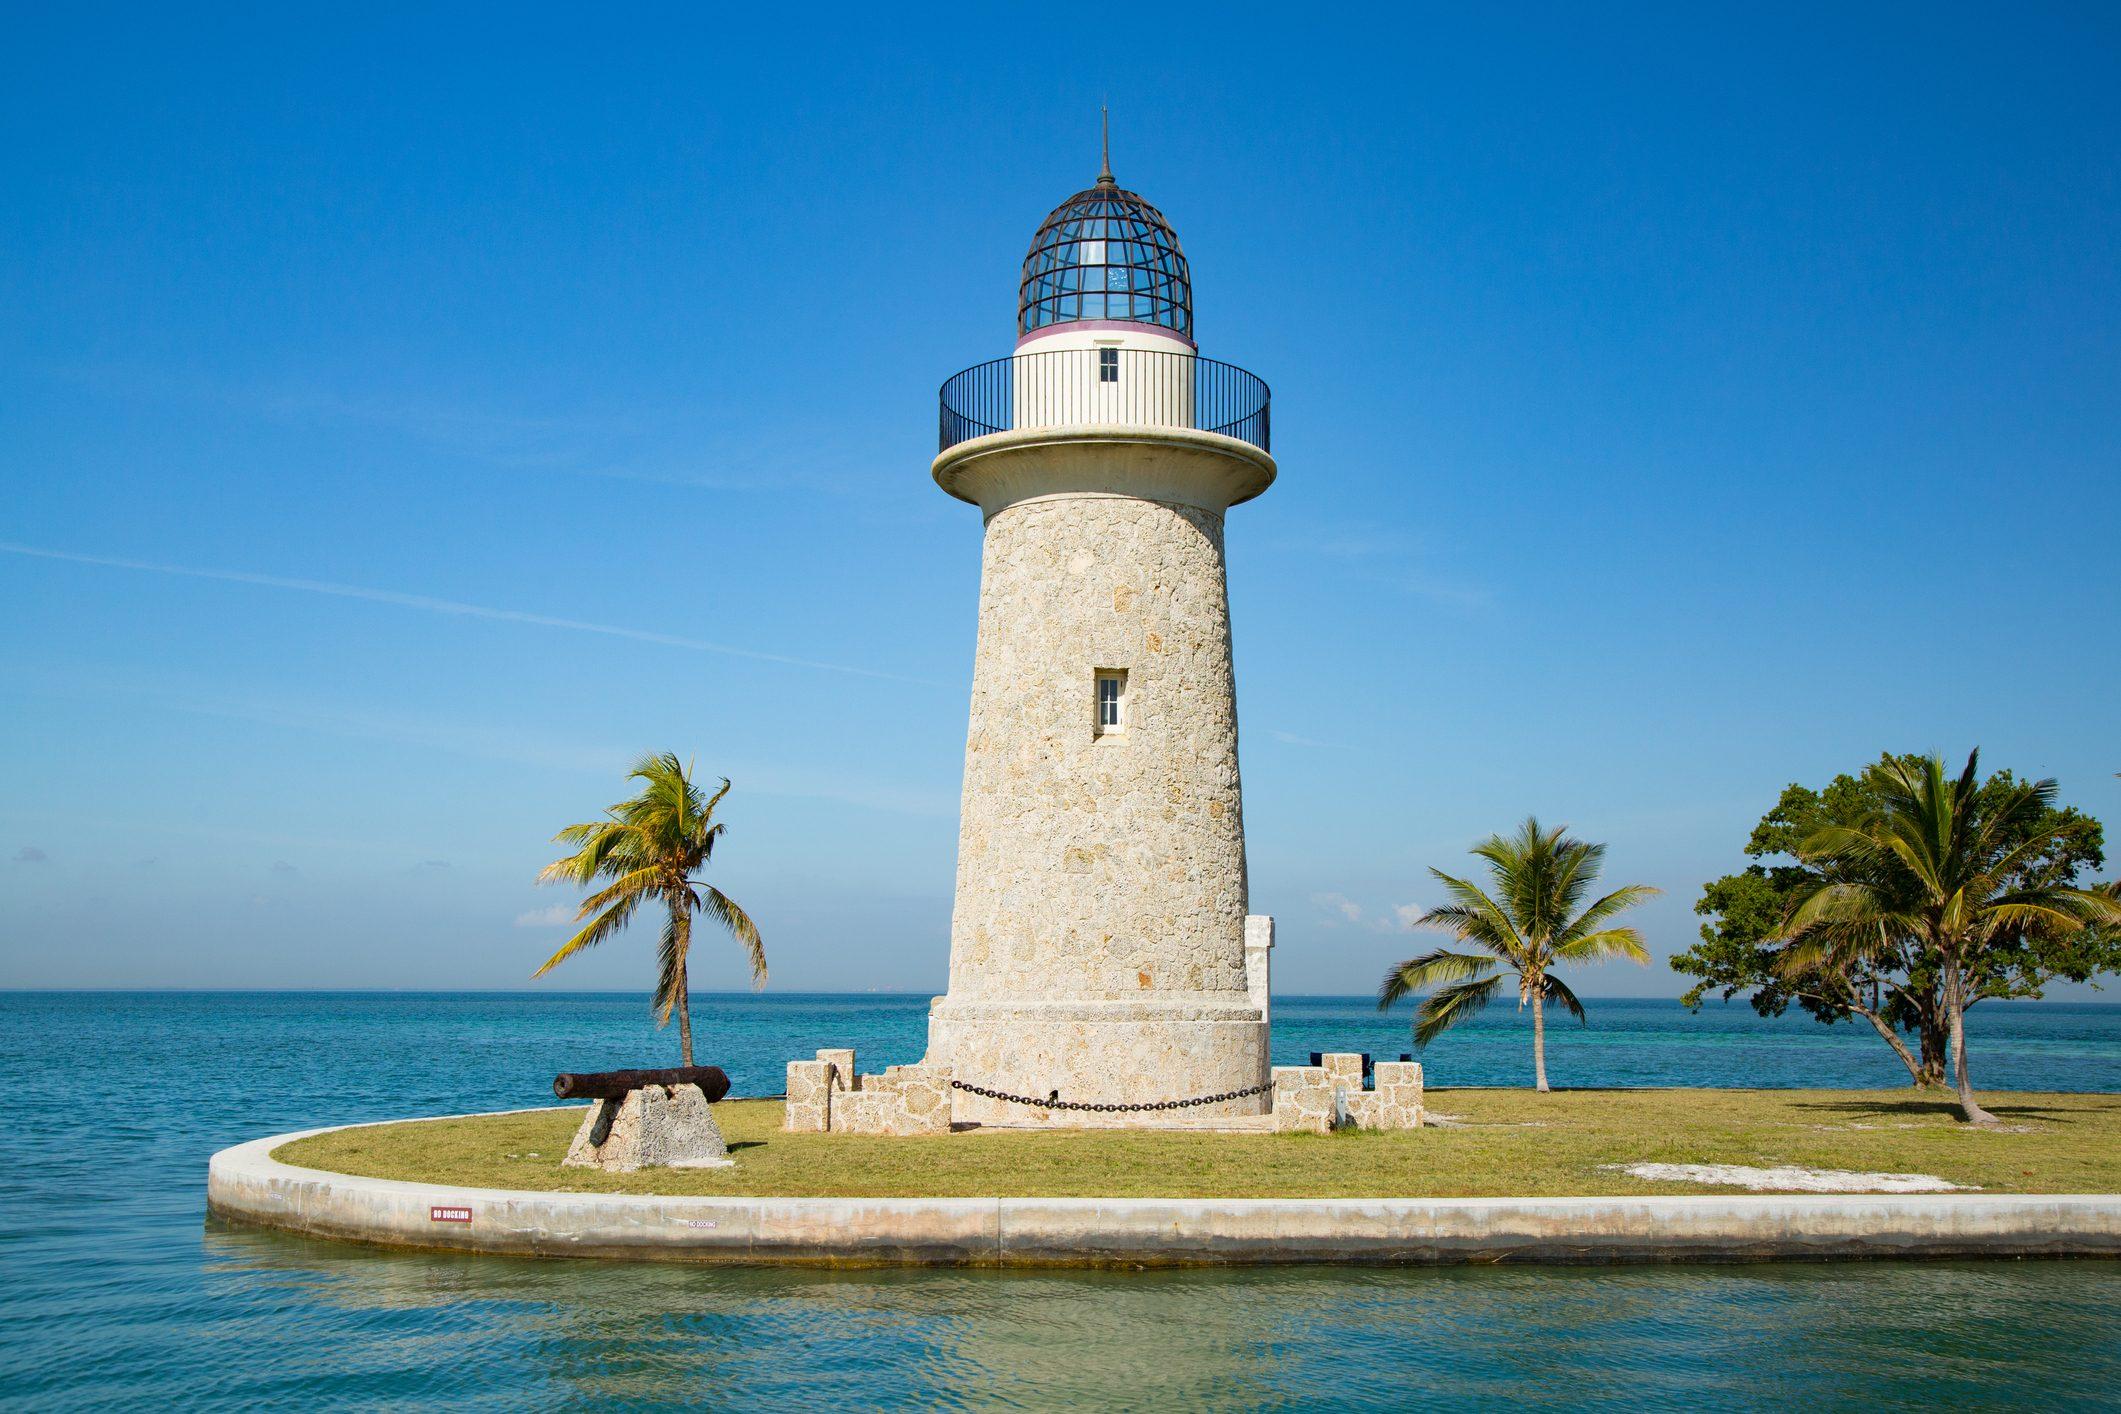 Boca Chita Lighthouse in Biscayne Bay Florida USA.